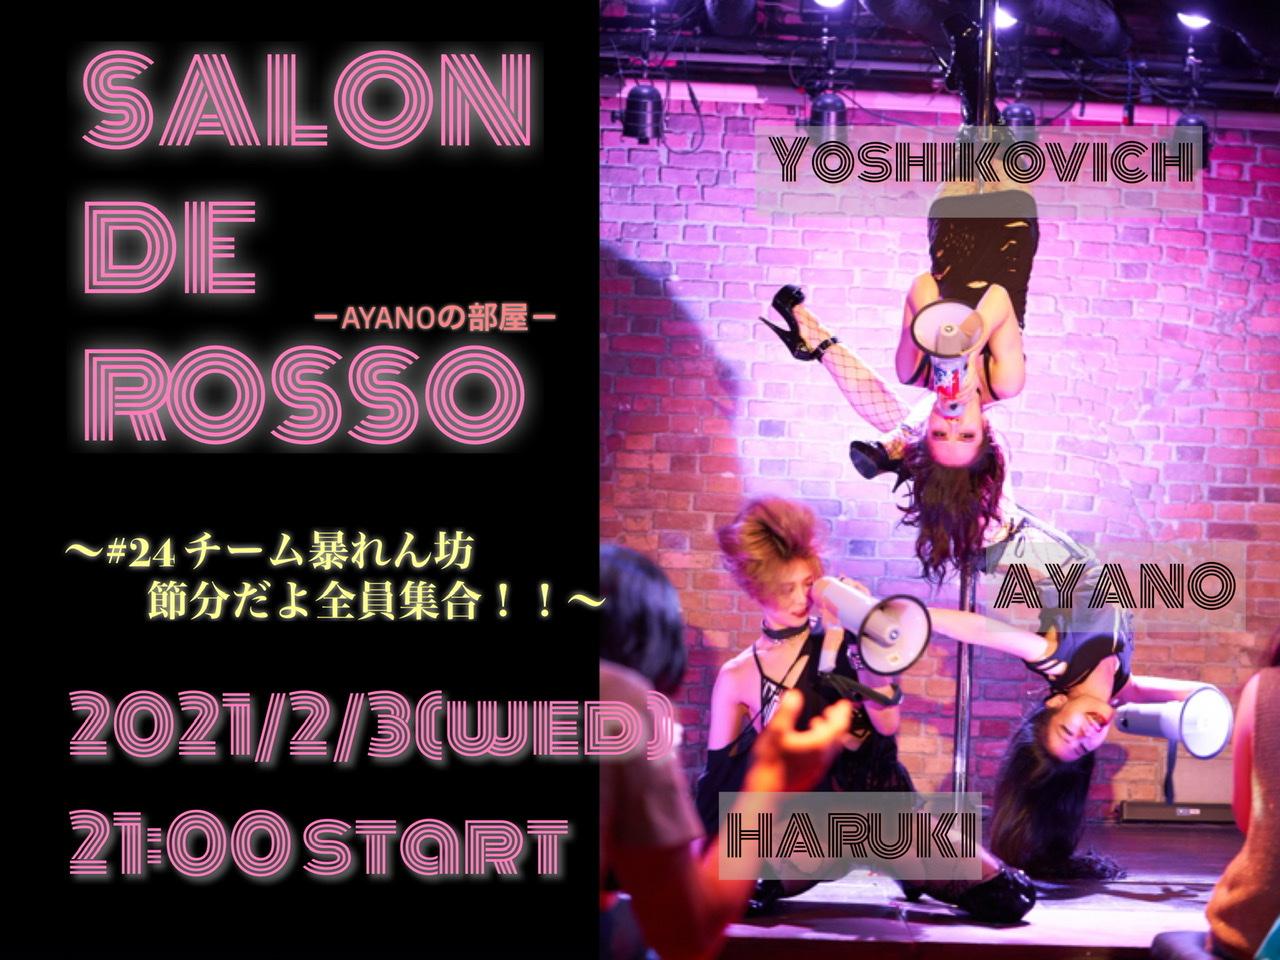 【 Salon de ROSSO ーAYANOの部屋ー】 〜 #24 チーム暴れん坊節分だよ全員集合!!〜